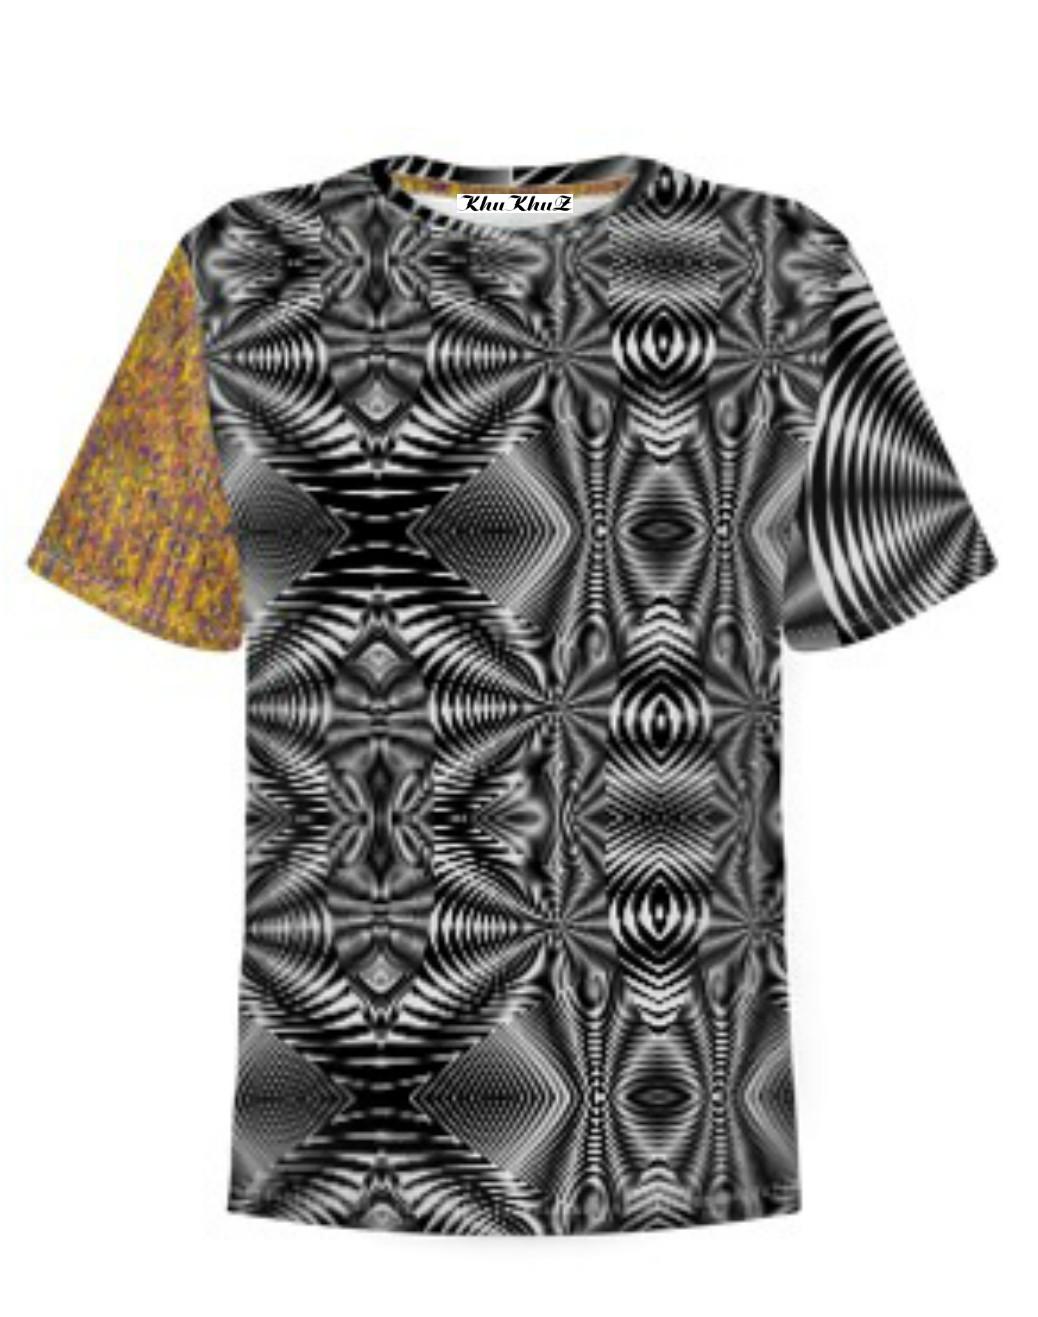 T-Shirt Cotton, Yellow, Black & White Colour Block Print